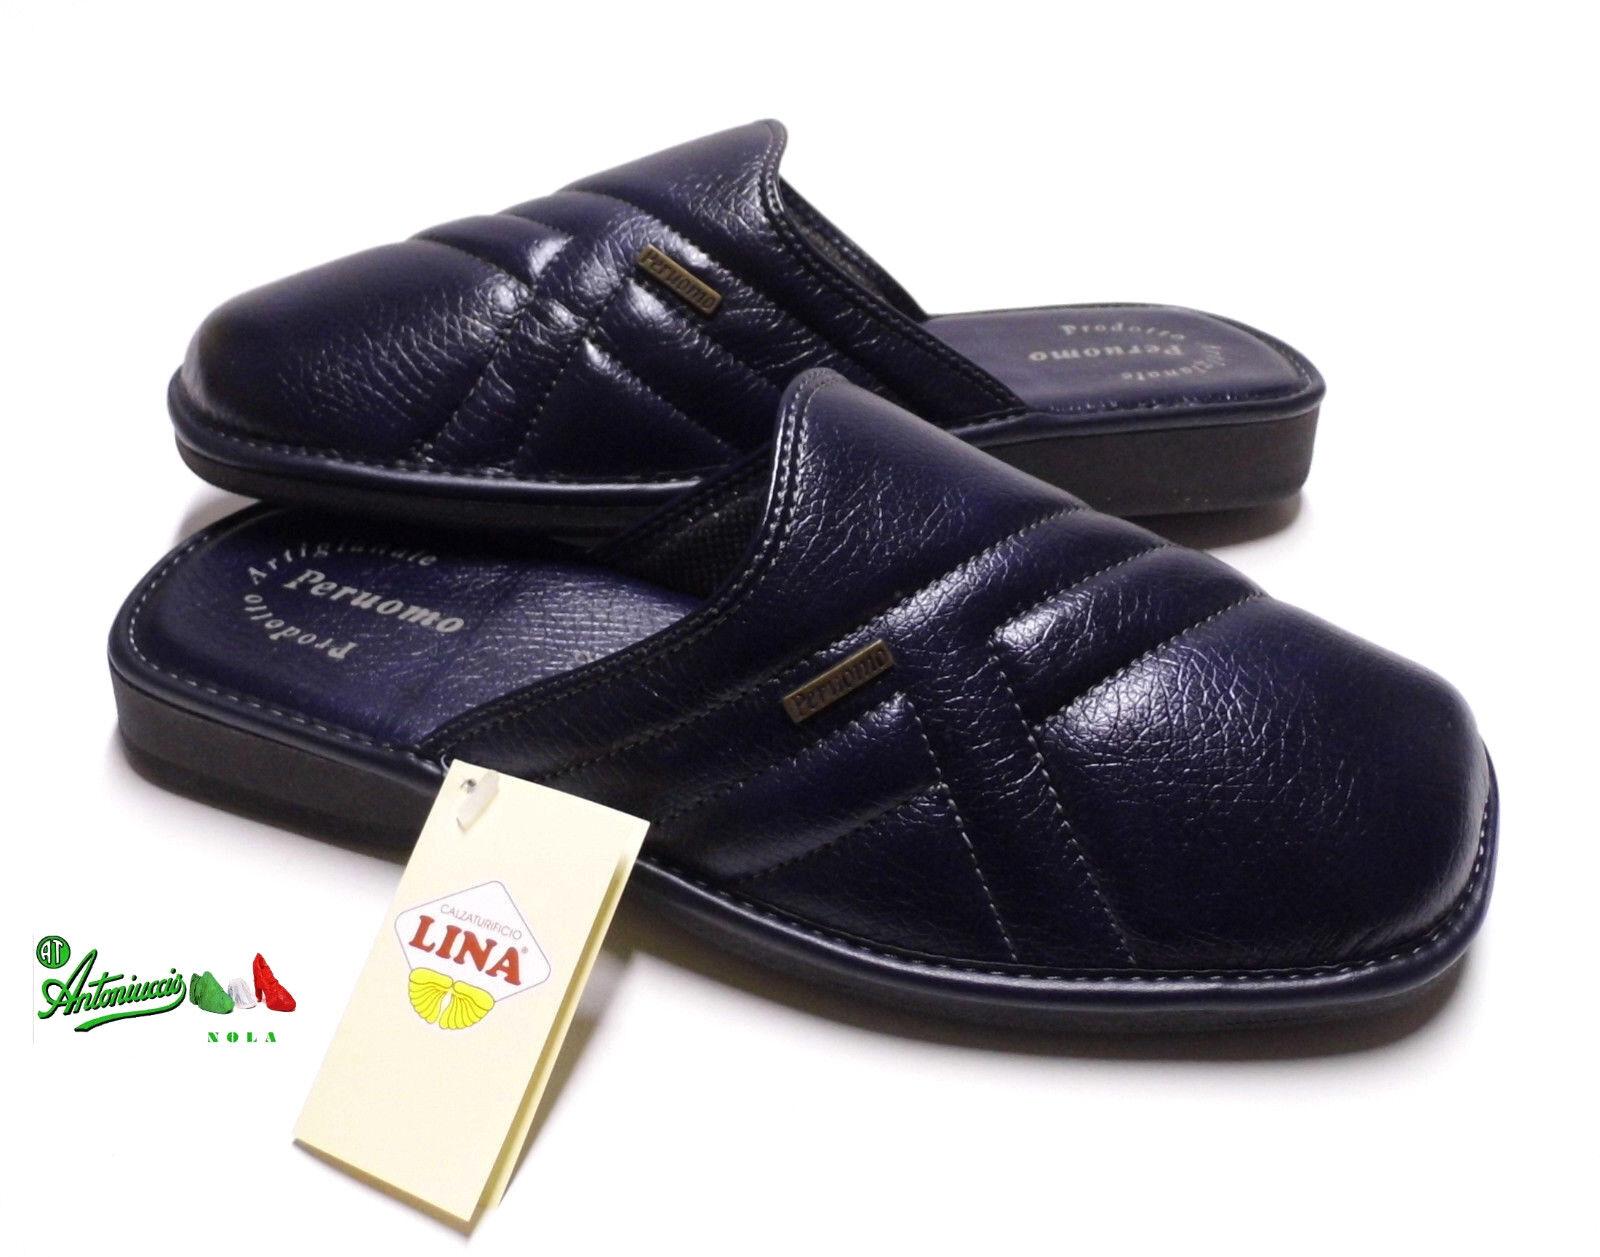 Pantofole ciabatte uomo PERUOMObyLINA comode puntachiusa 93982 solettapelle BLU 93982 puntachiusa 0cd190